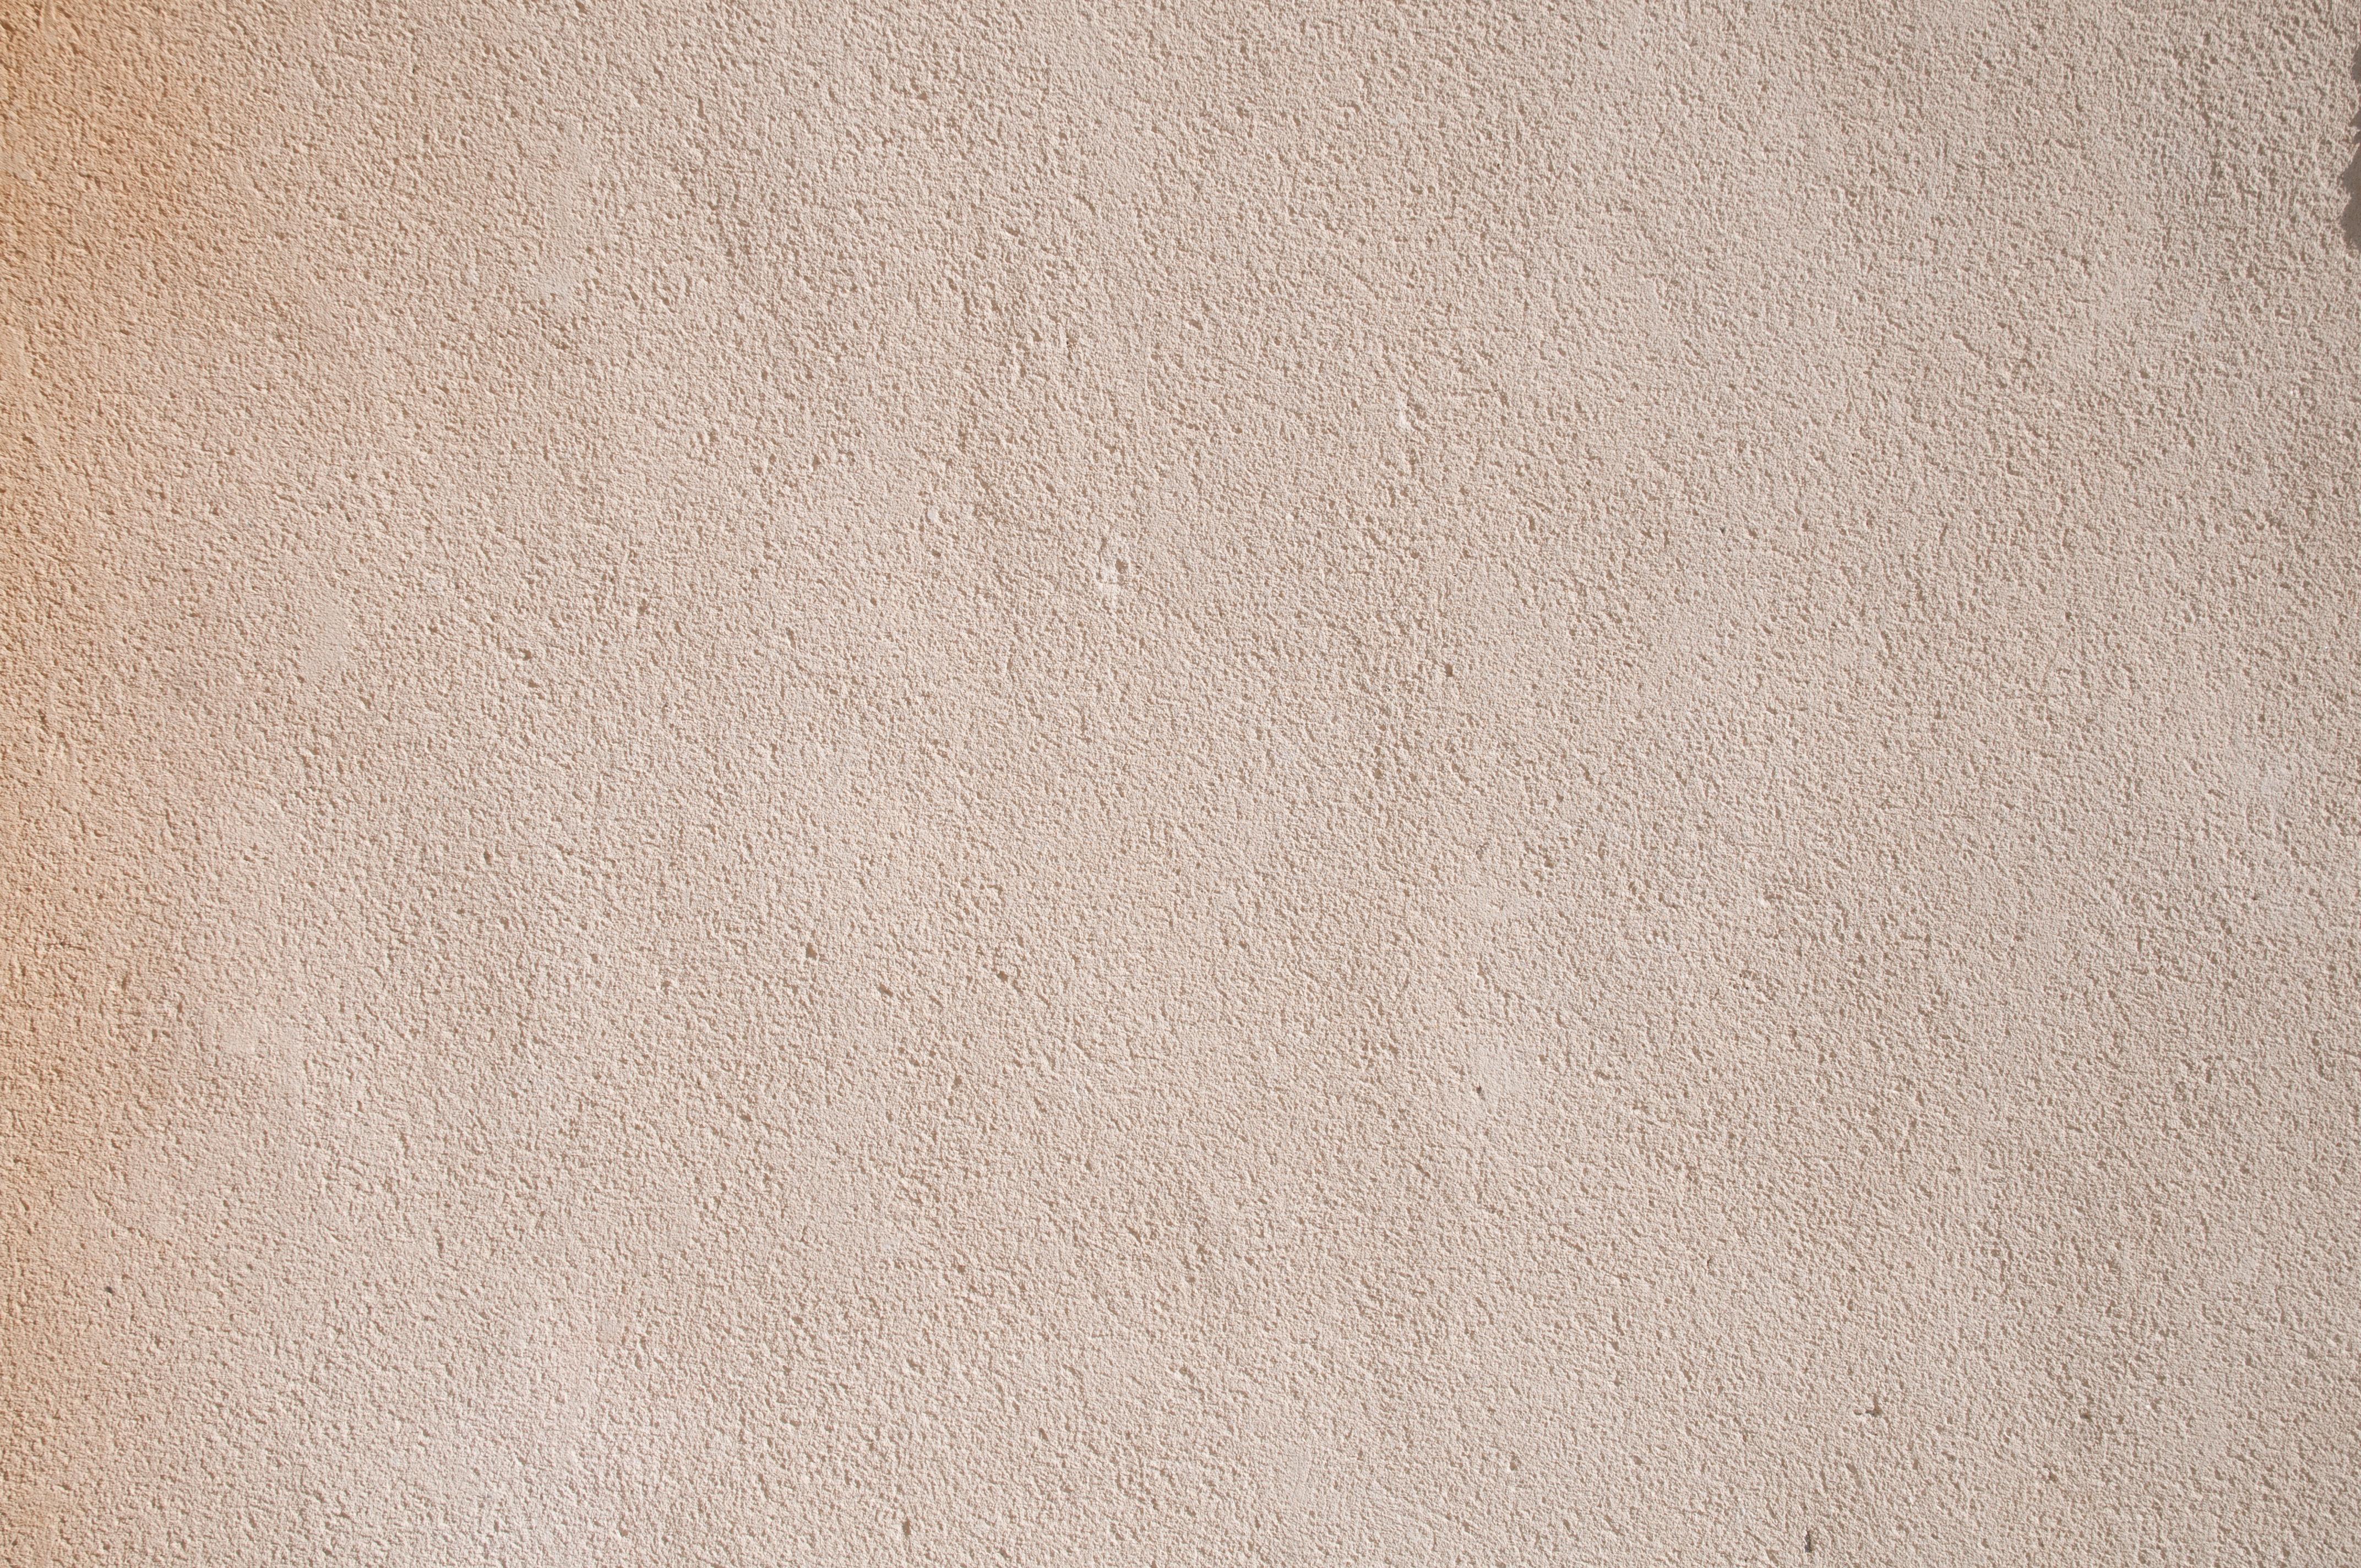 Subtle grain plaster wall beige